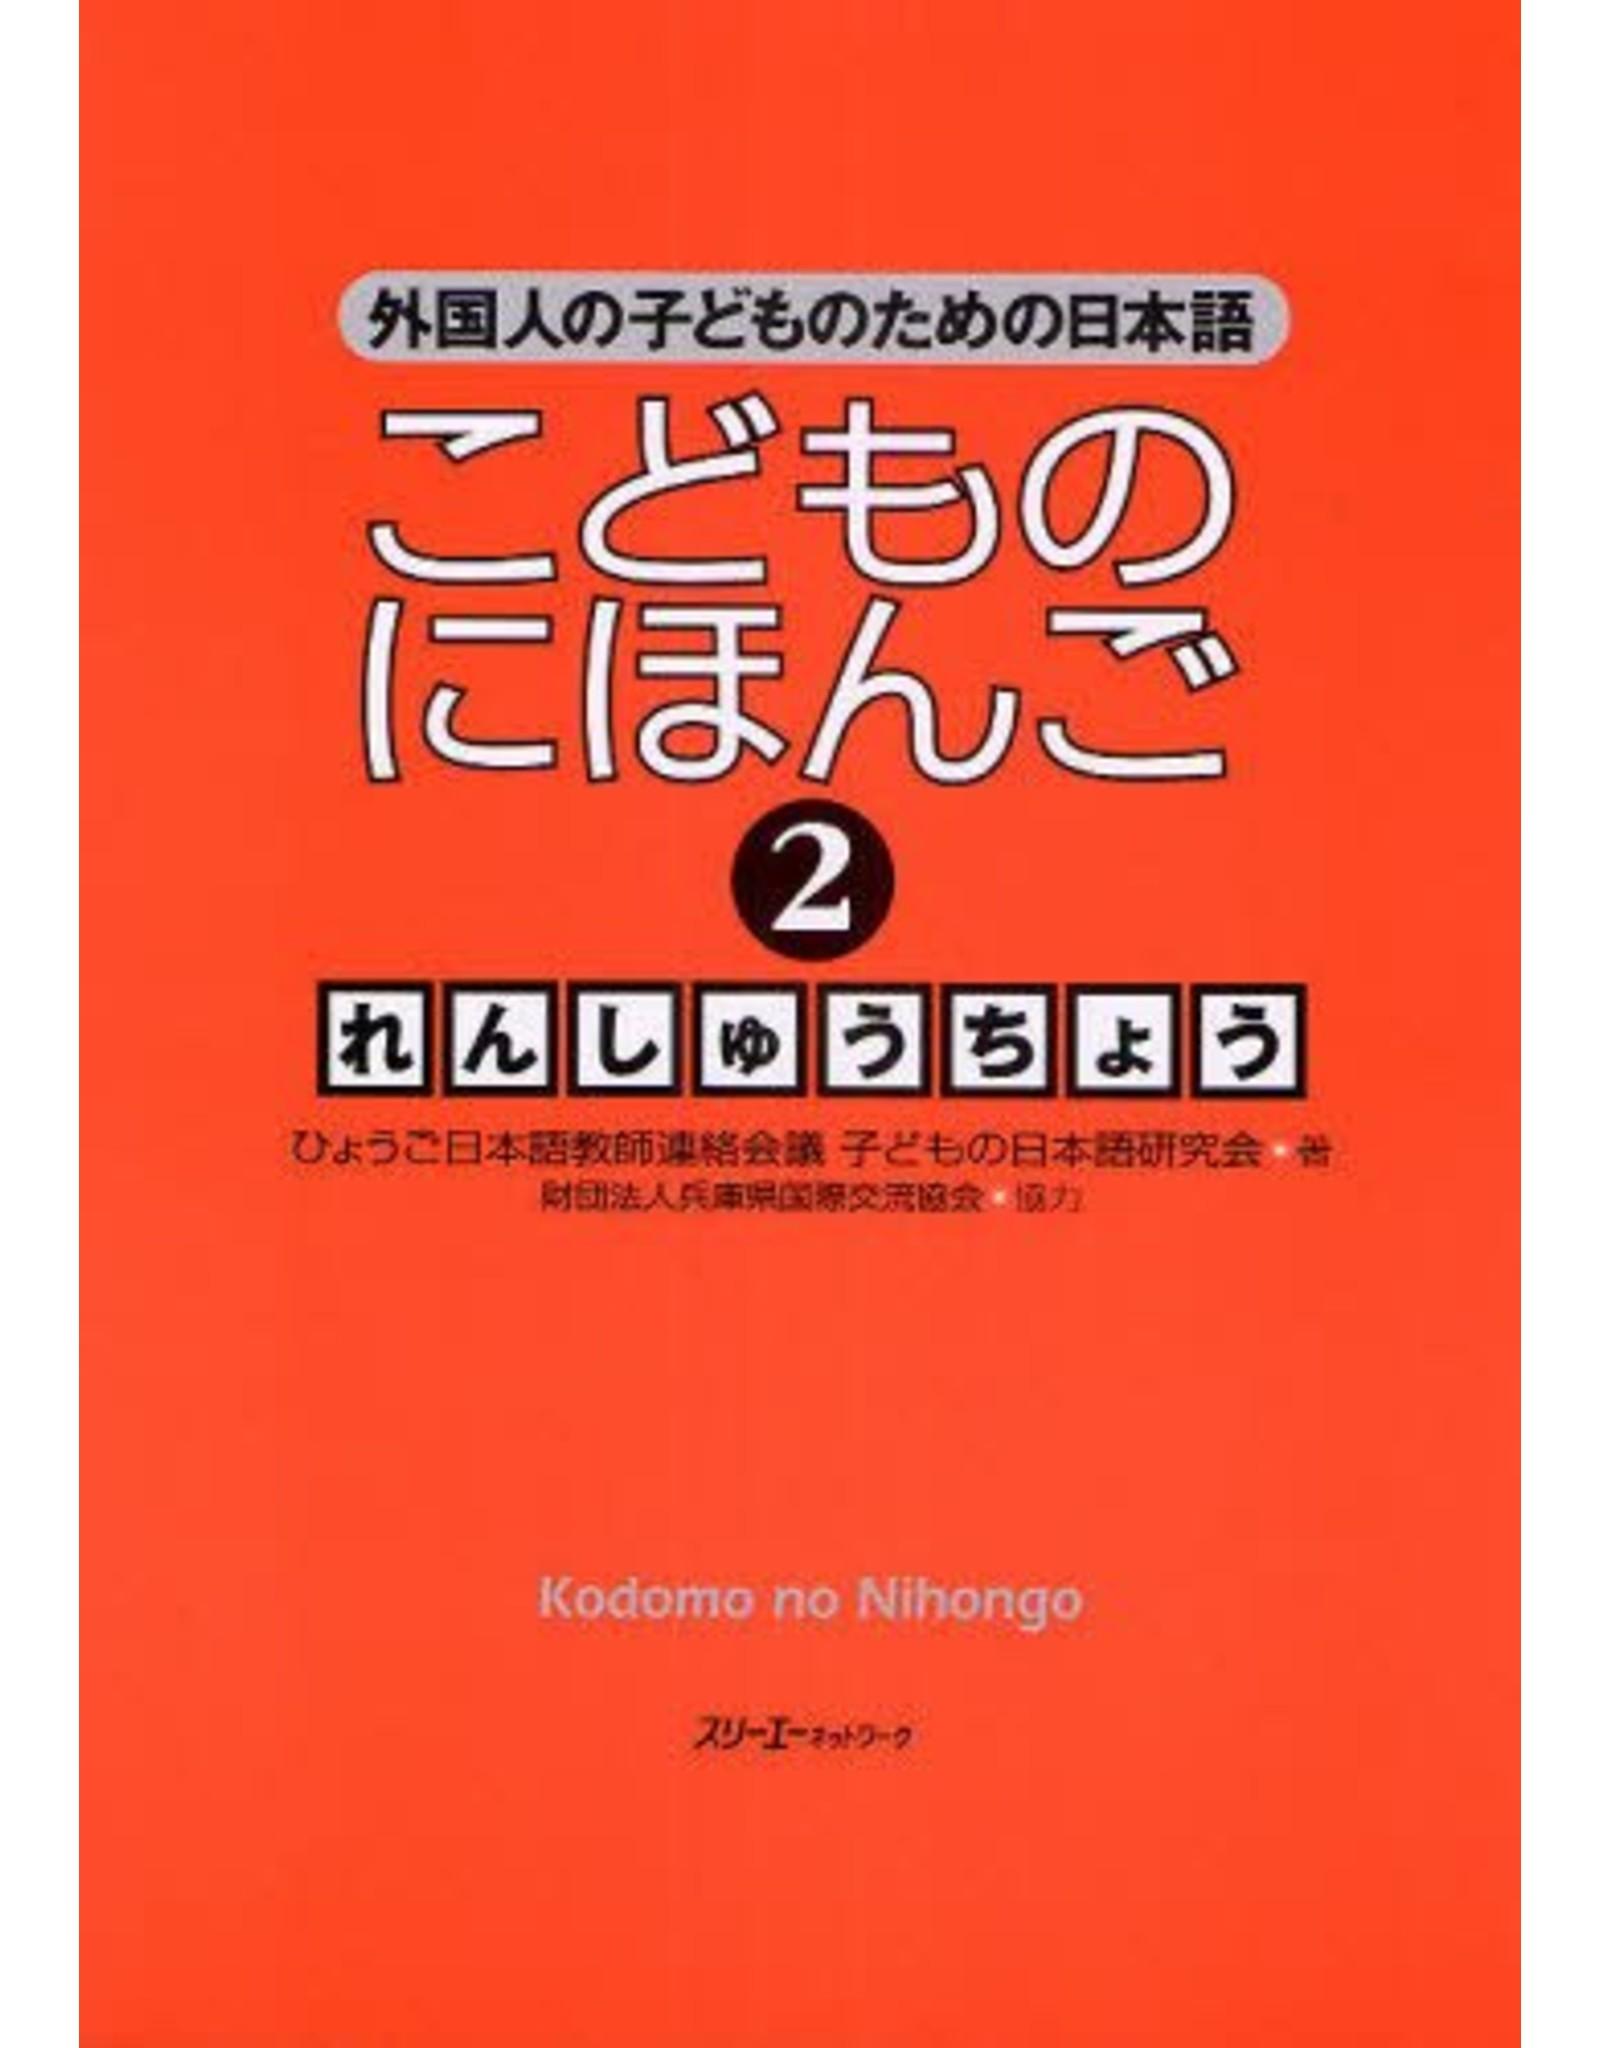 3A Corporation KODOMO NO NIHONGO (2) WORKBOOK